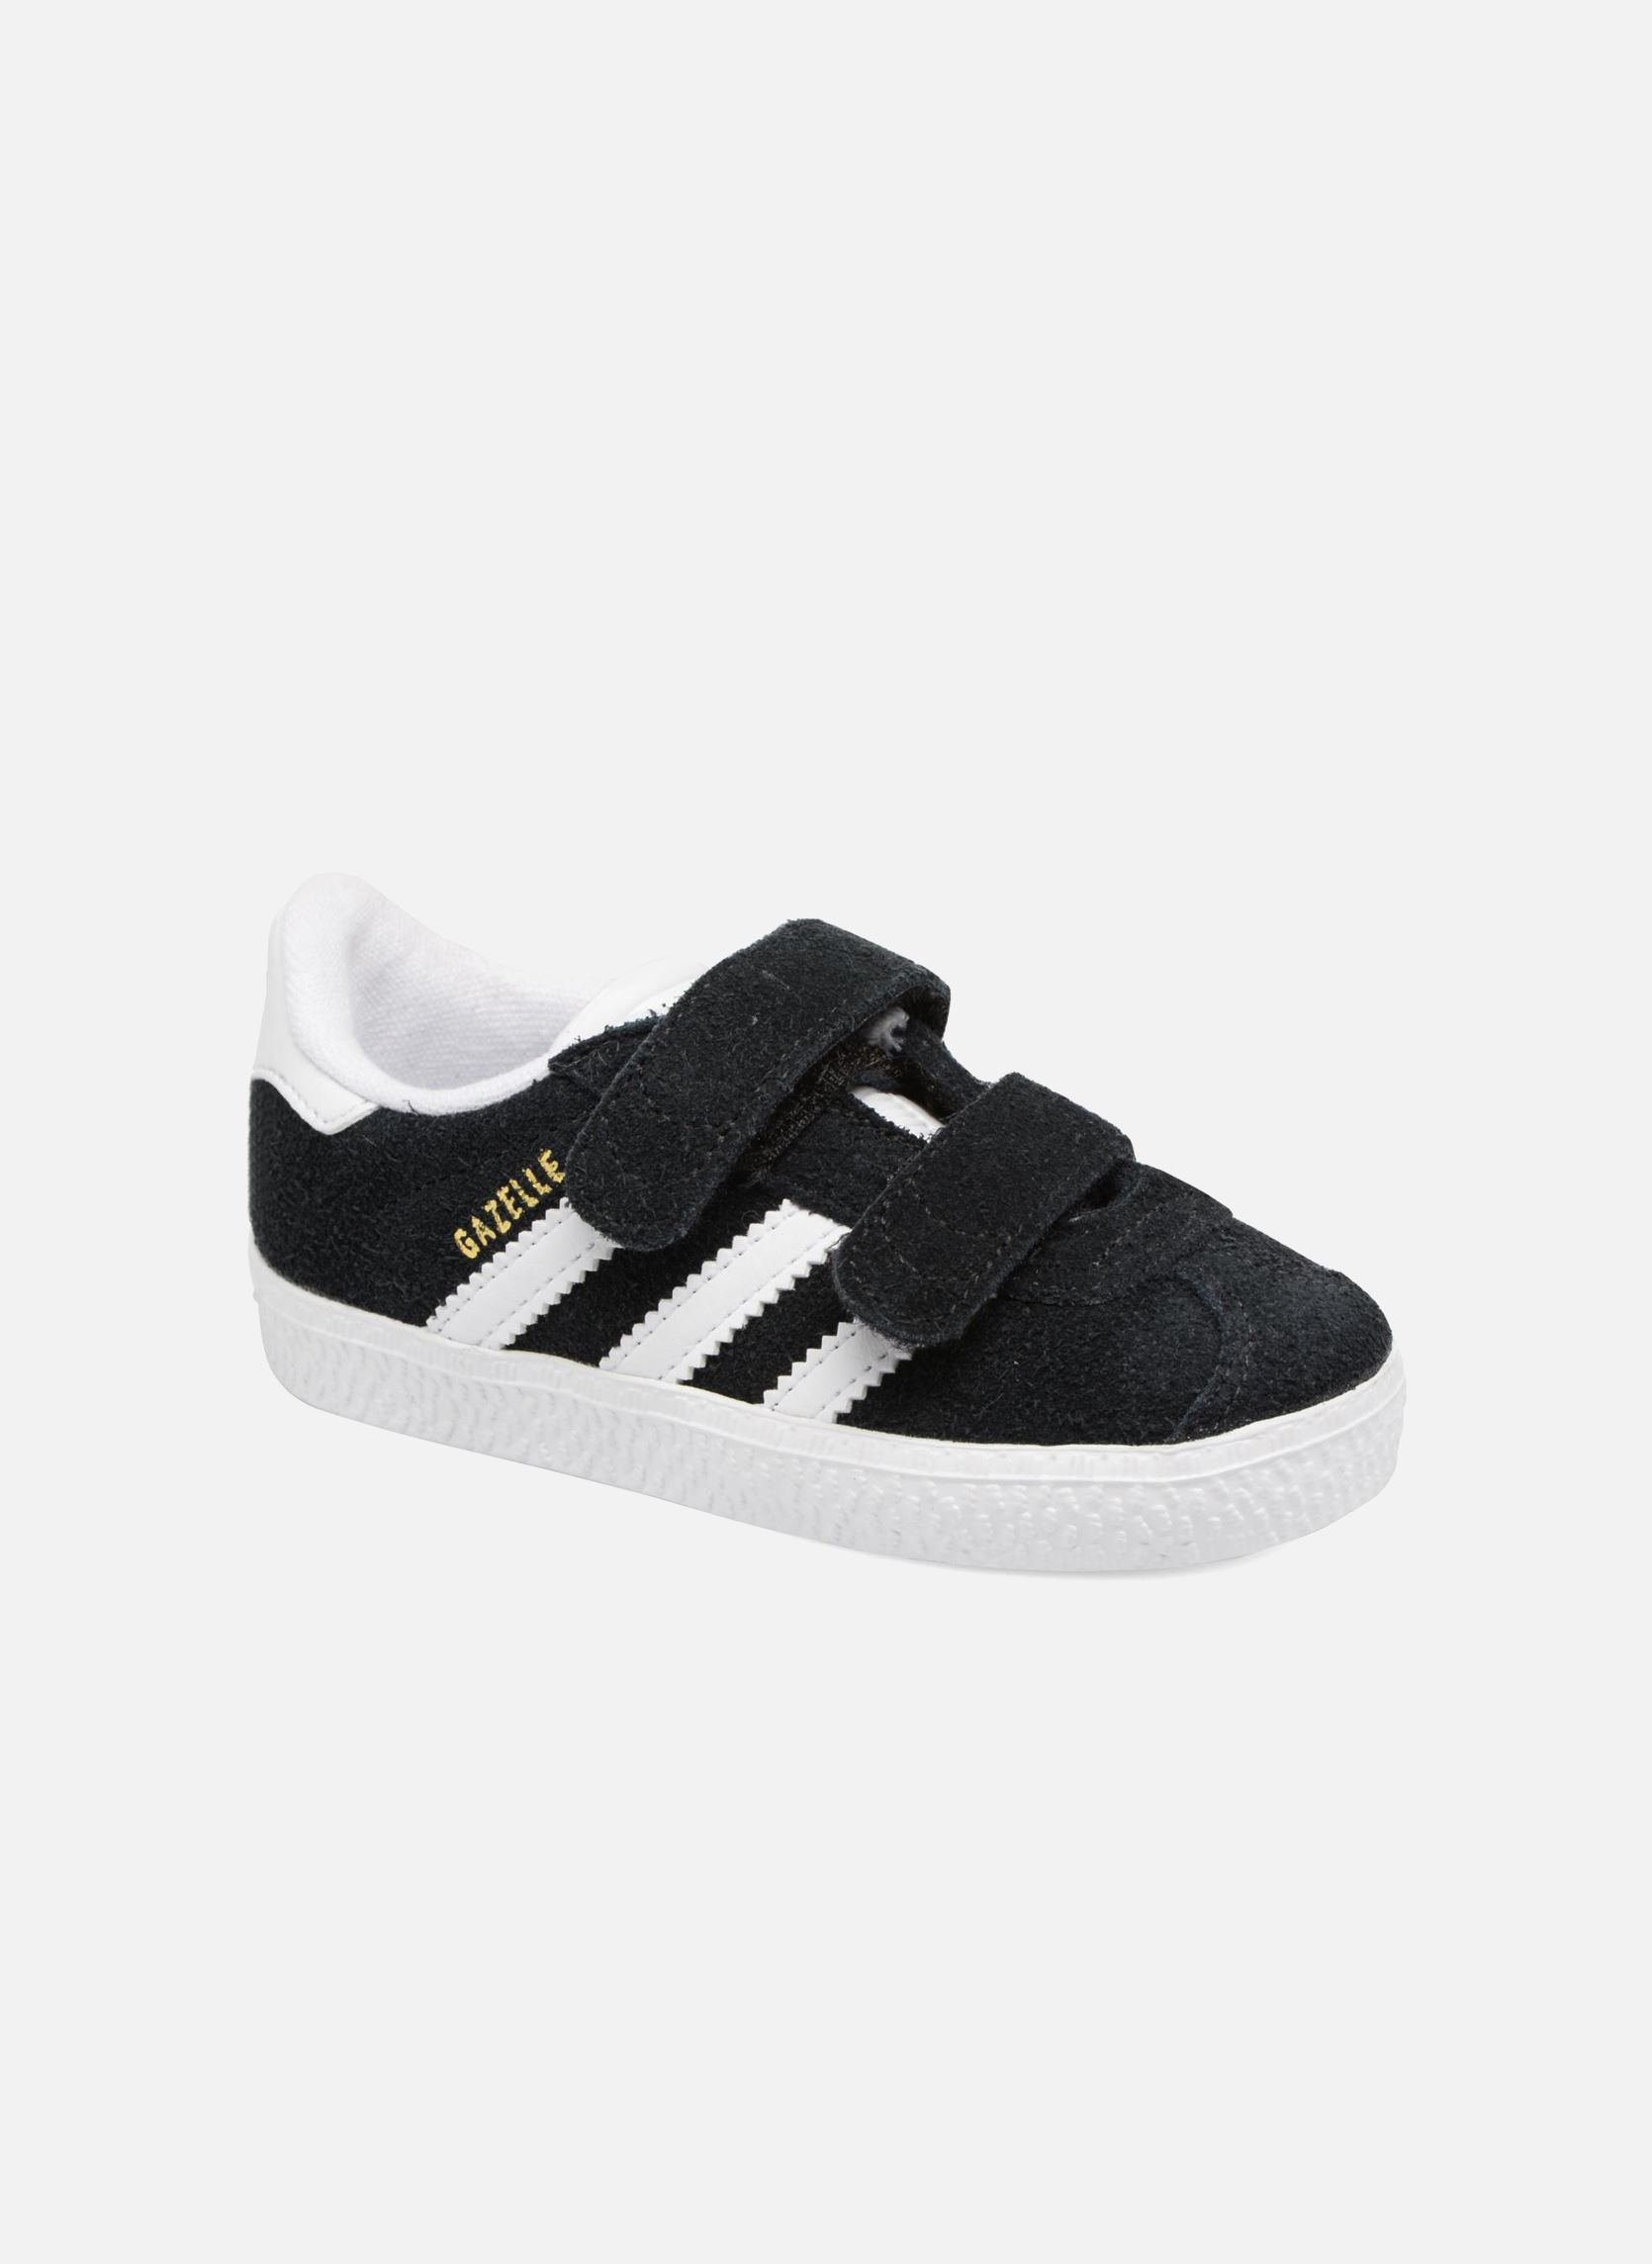 Adidas gazelle More | Mode | Chaussure, Tendance chaussures